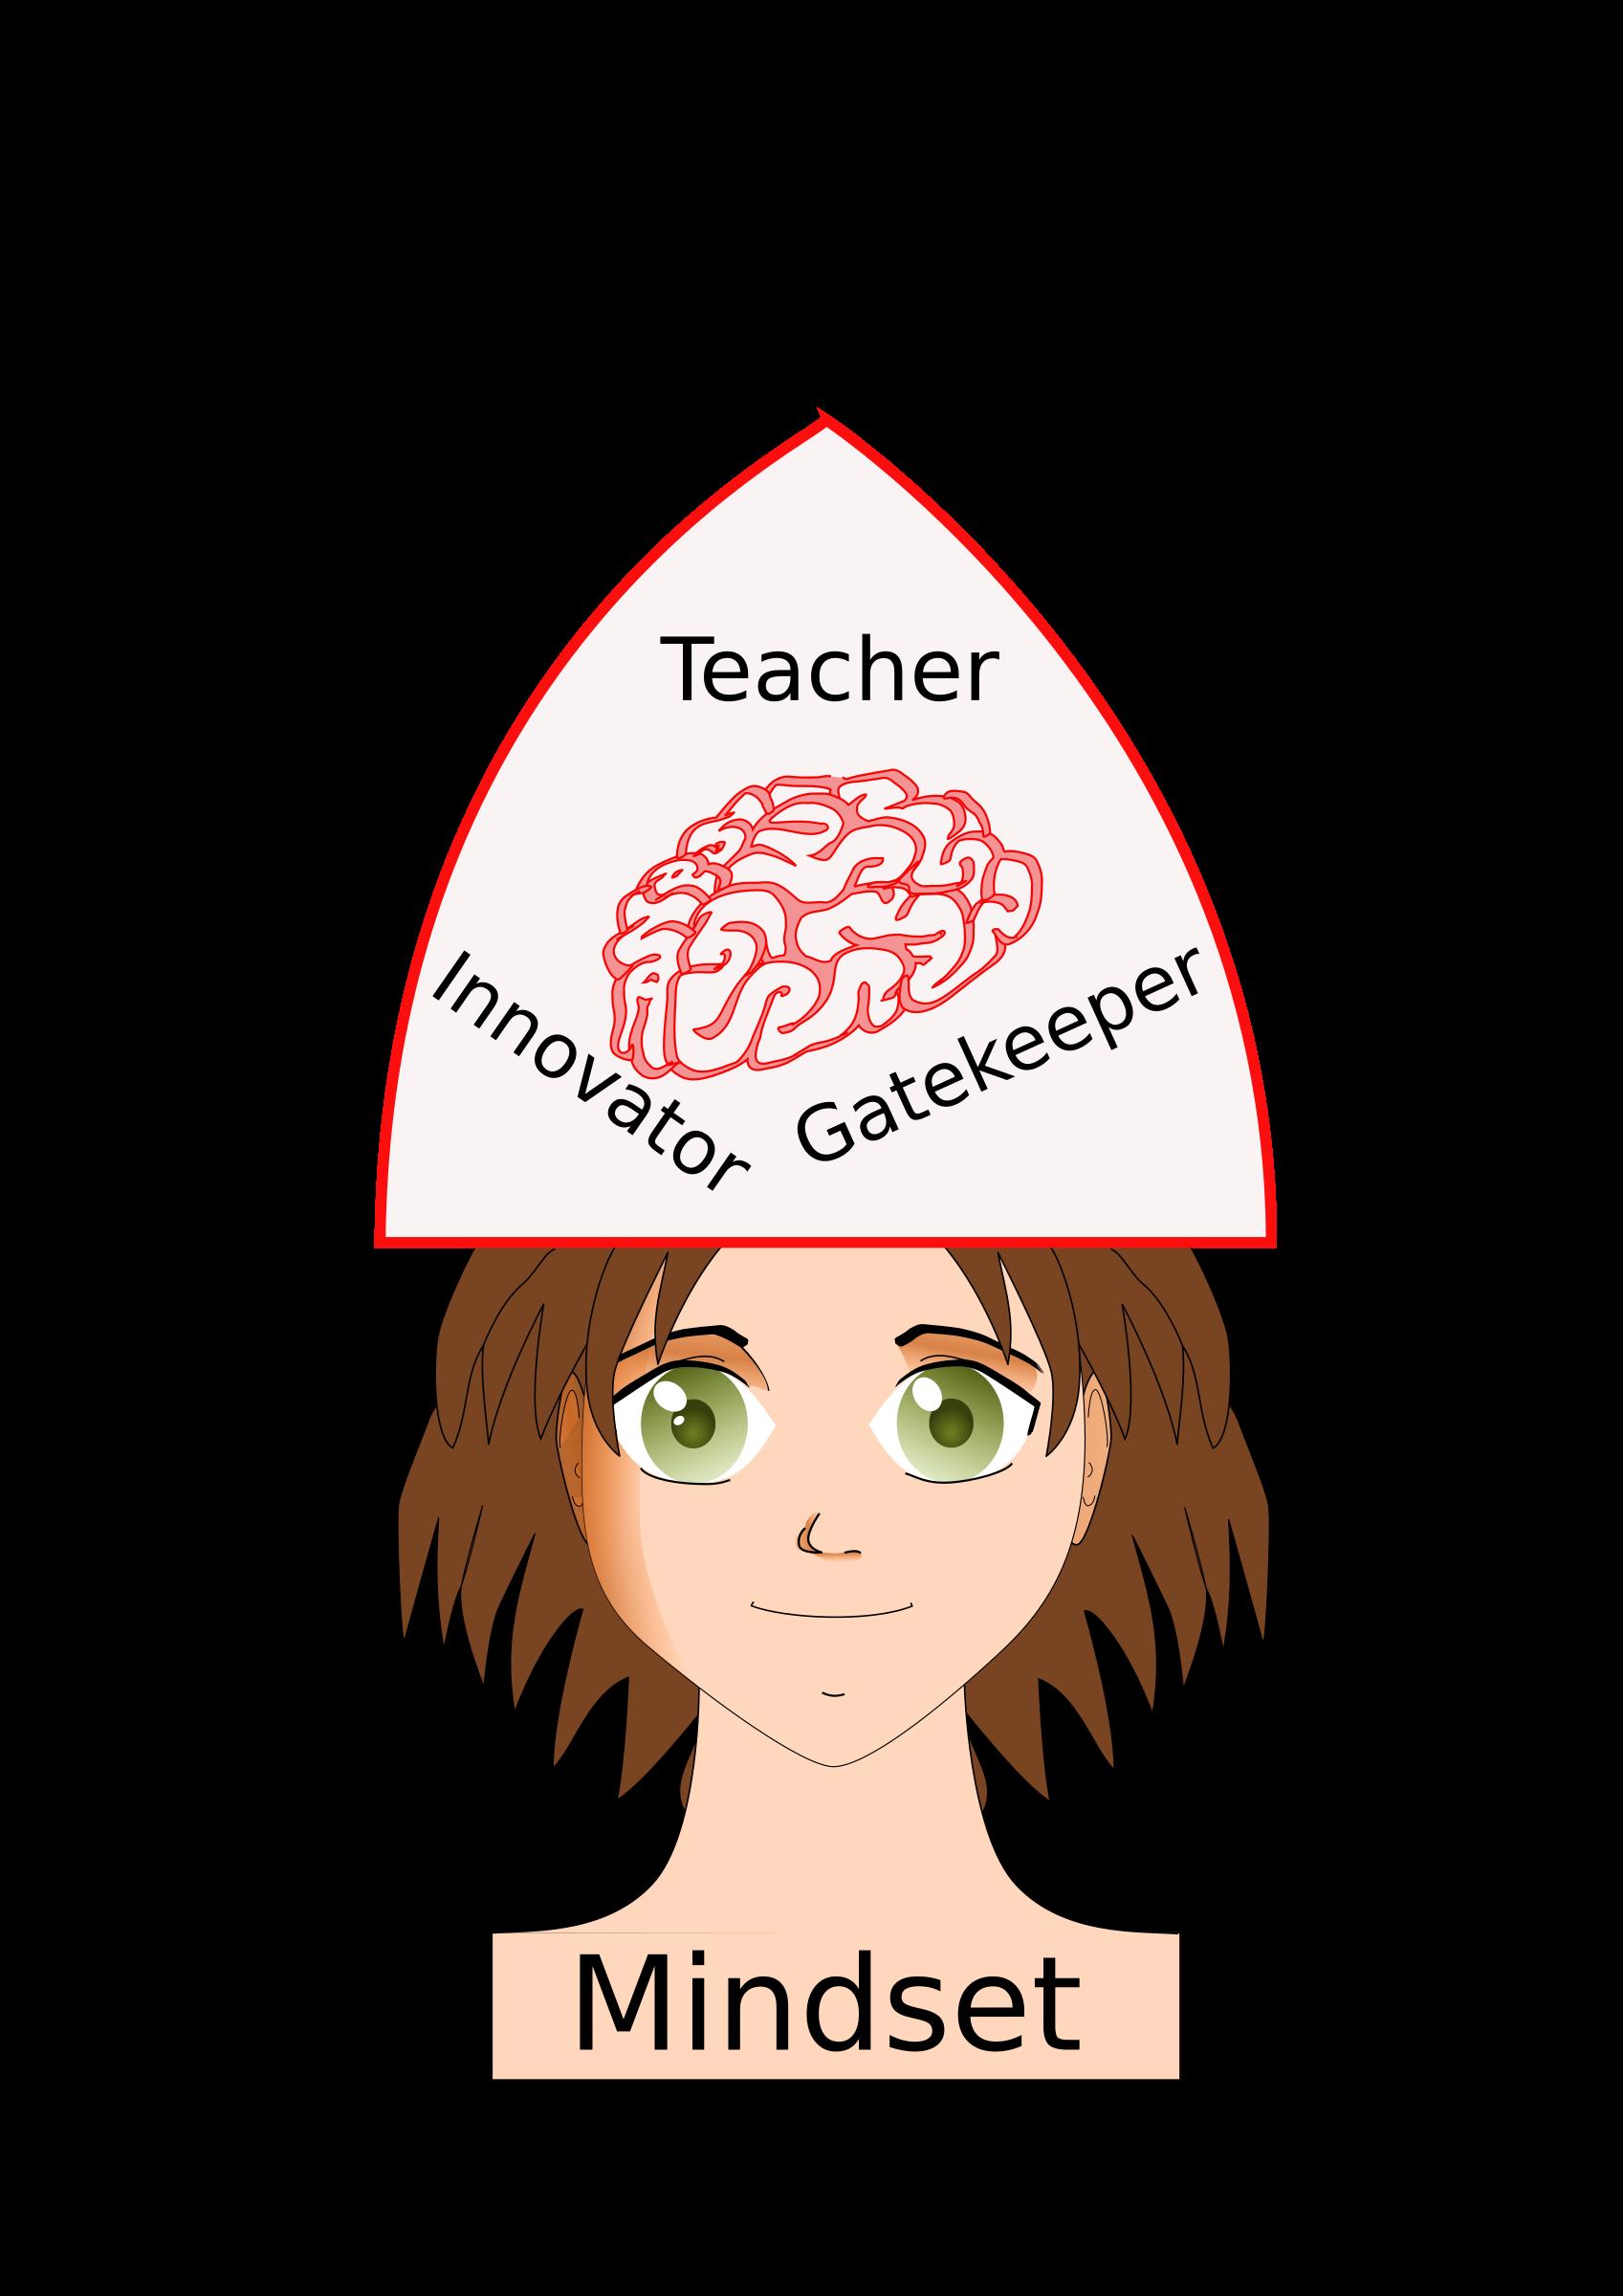 Clipart - Teacher Mindset - Innovator Gatekeeper